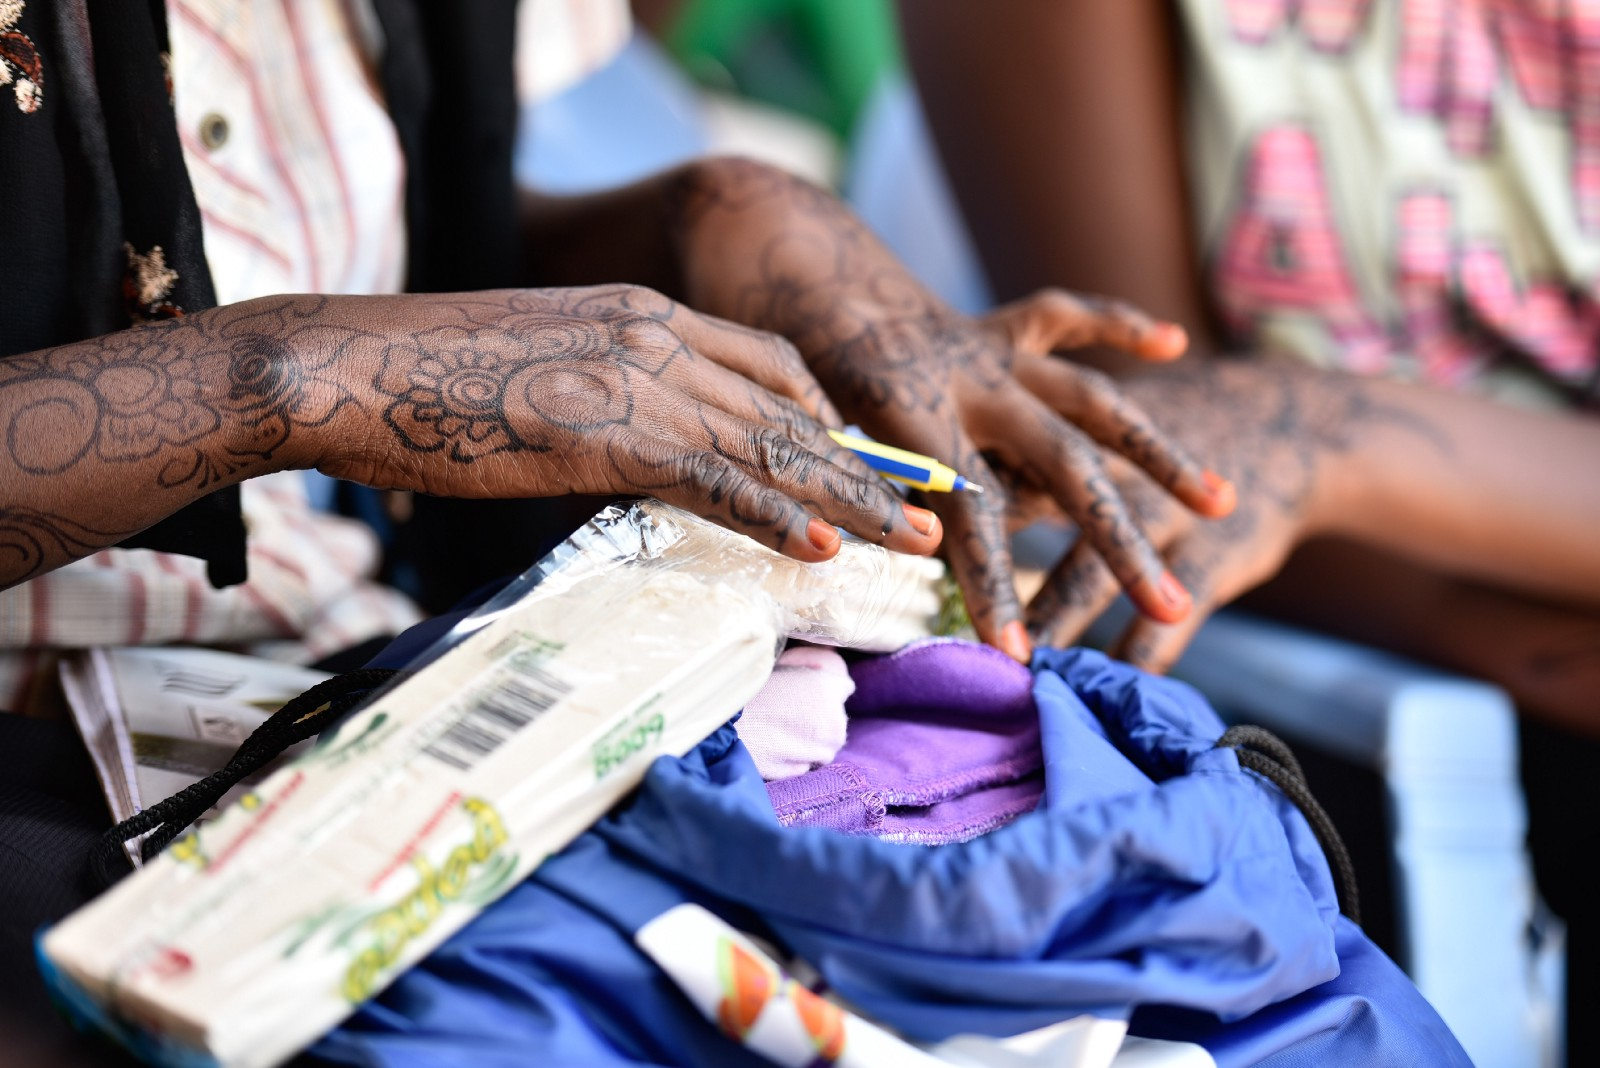 A young woman perusing her 'Huru Kit' containing reusable sanitary pads